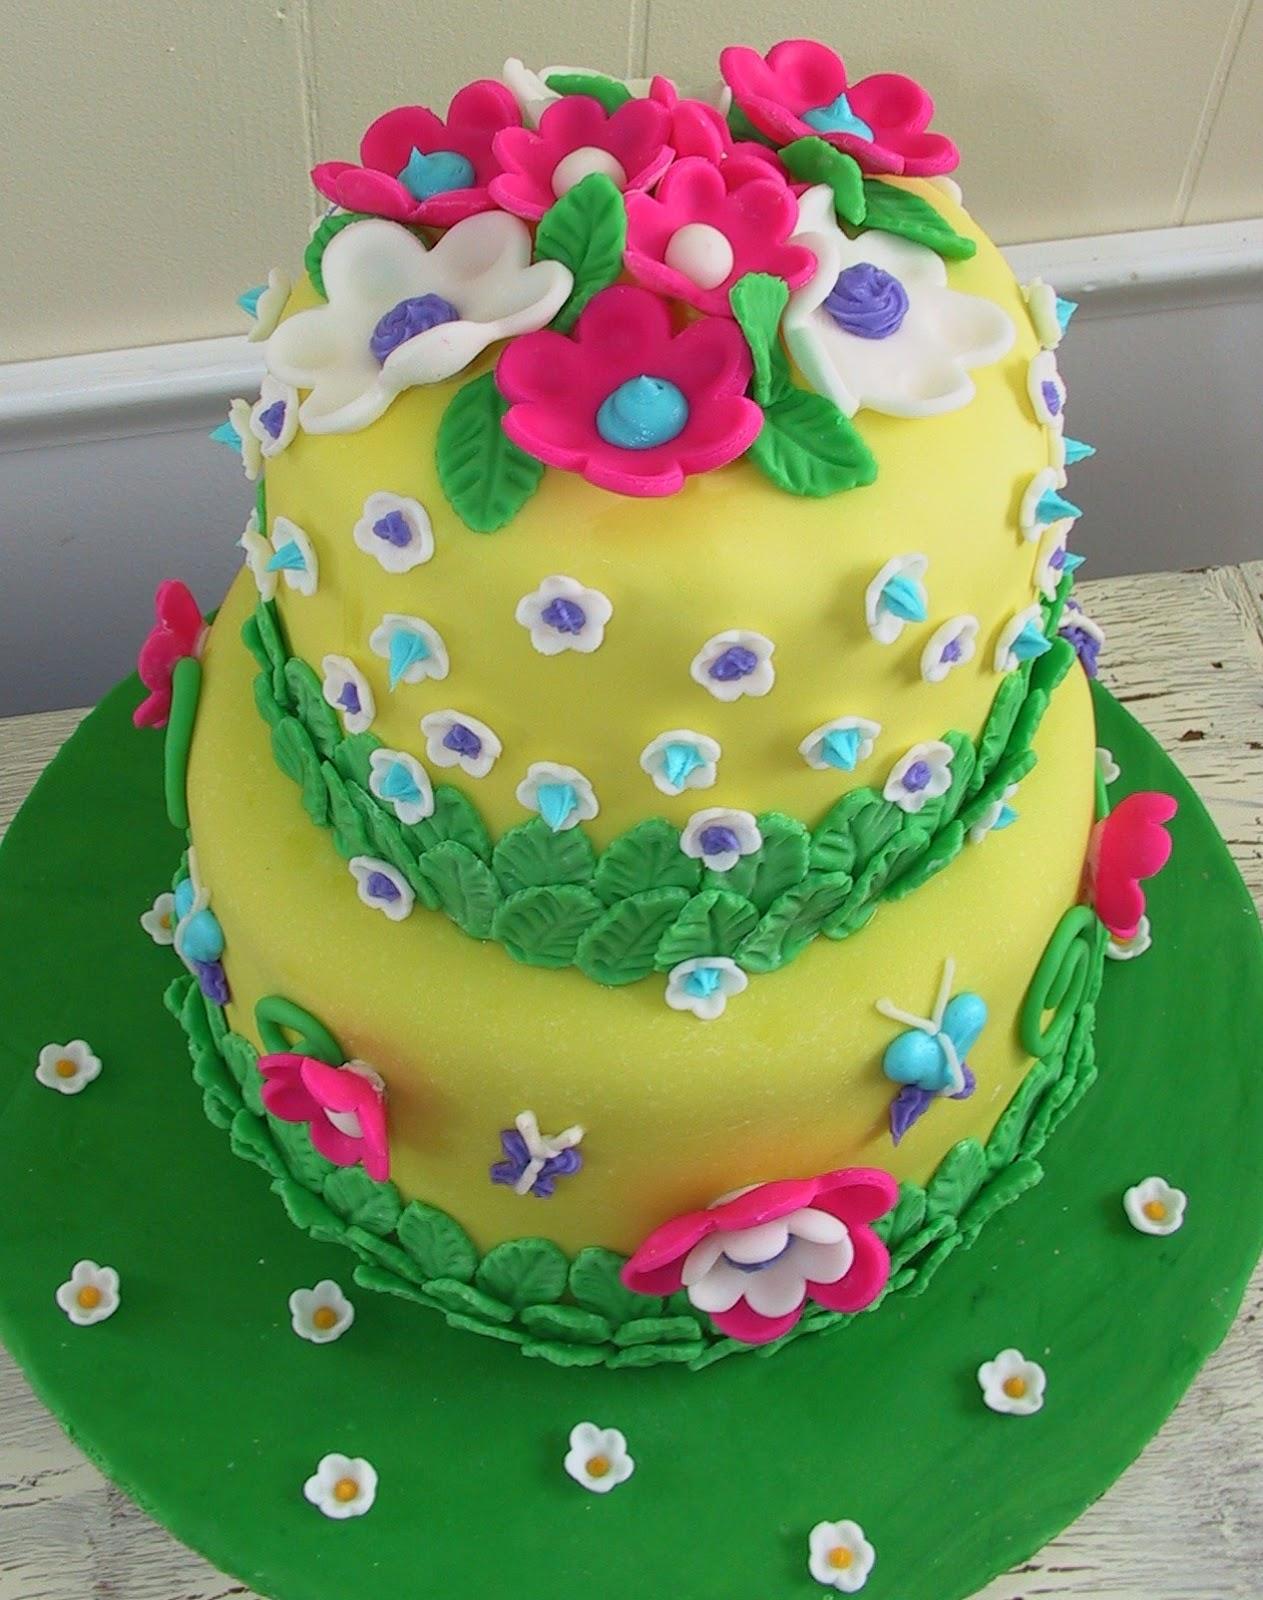 Cake Decoration For Birthday : Delicious Cake Blogger: Flower Birthday Cake Ideas